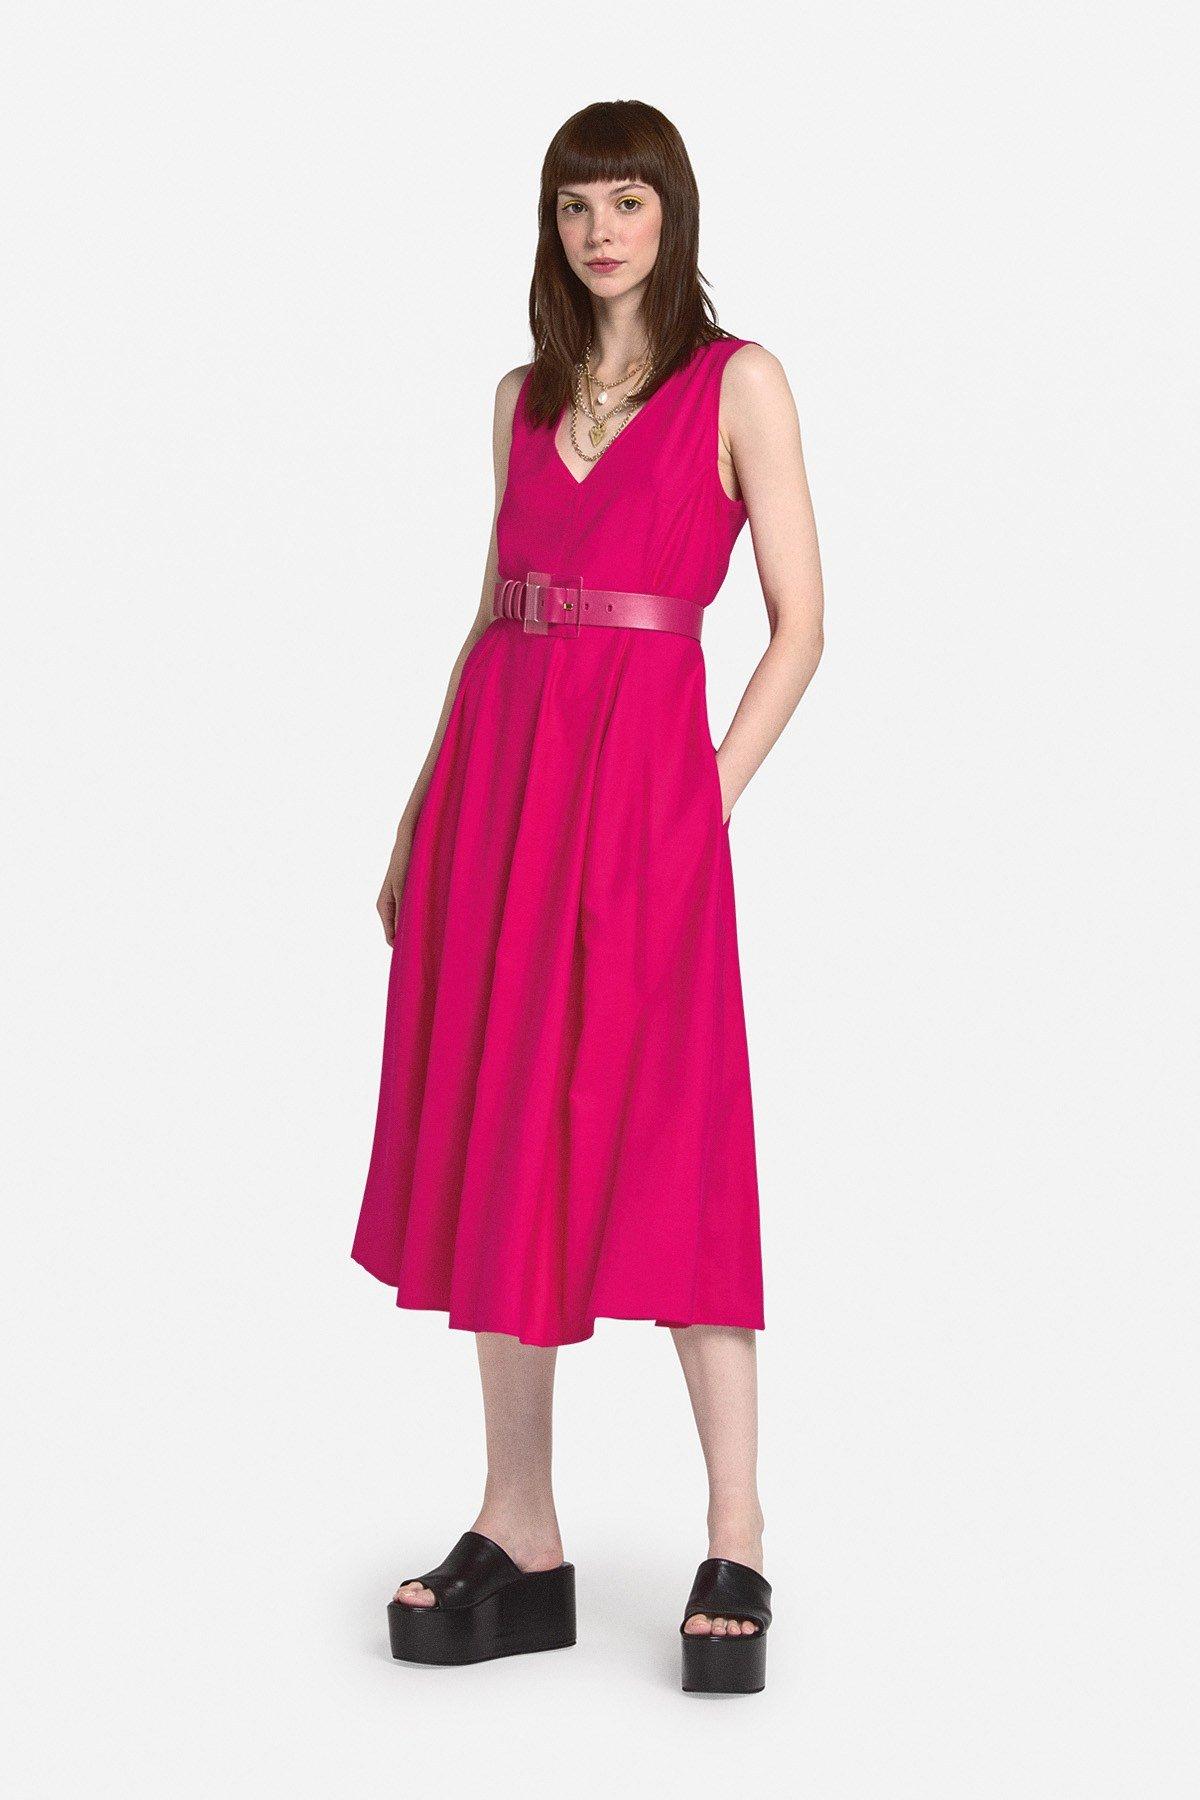 Midi dress with poodle skirt